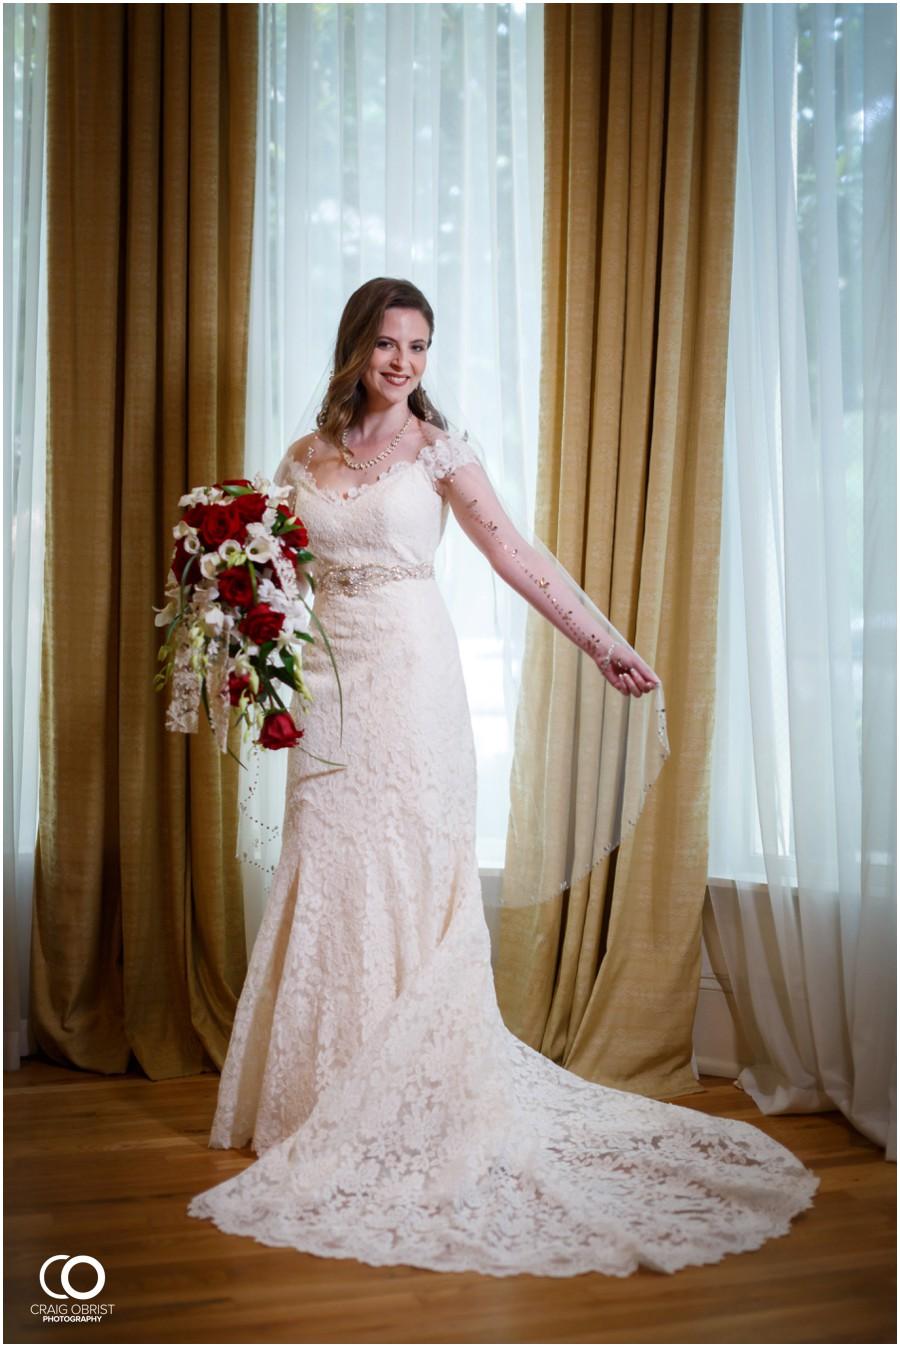 Wimbish-House-Loews-hotel-wedding-portraits-atlanta_0018.jpg